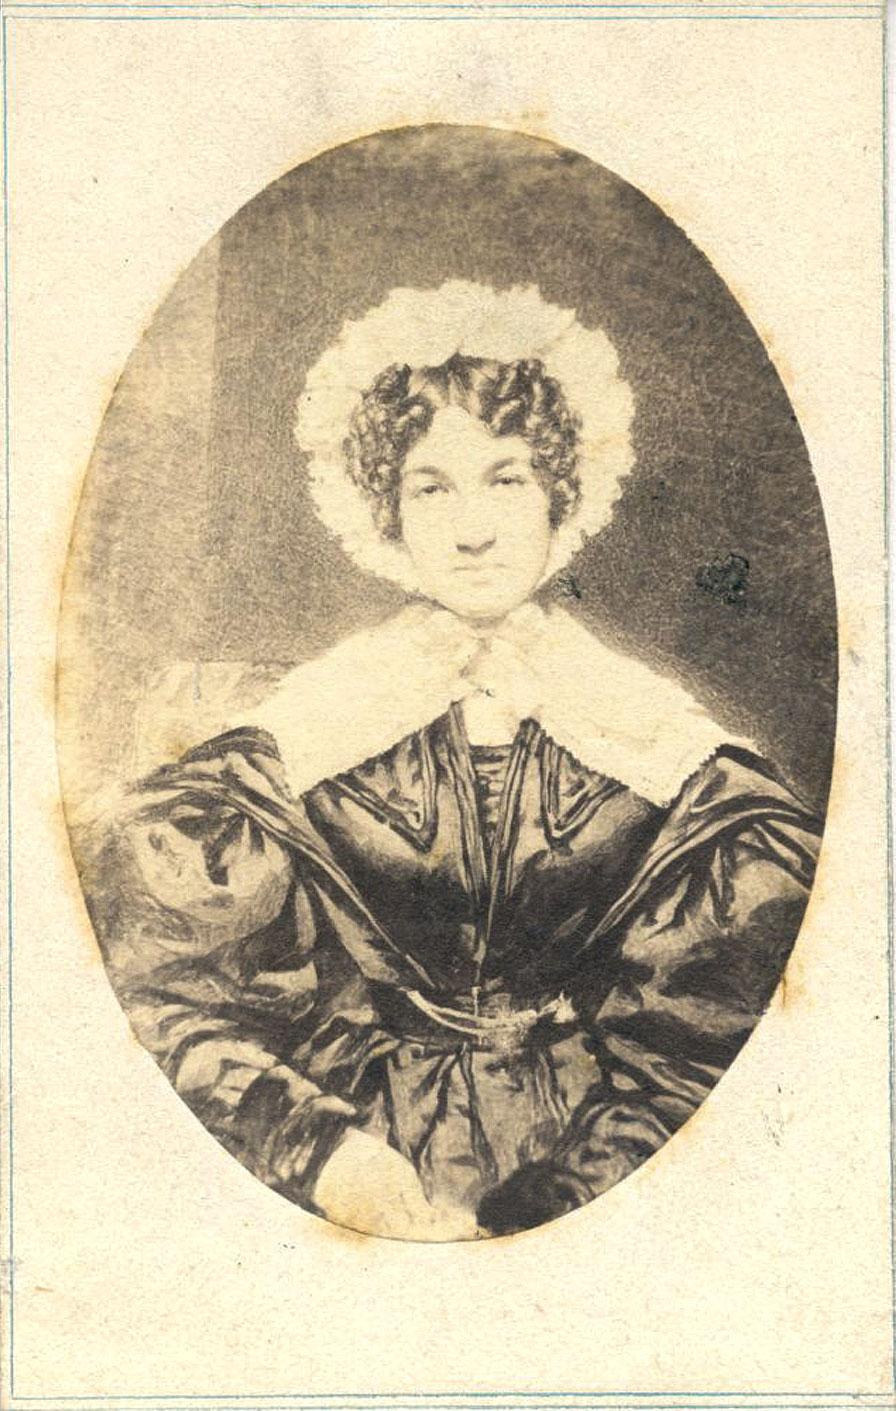 Lucy Bakewell Audubon, 1835. F. Cruikshank/Public Domain